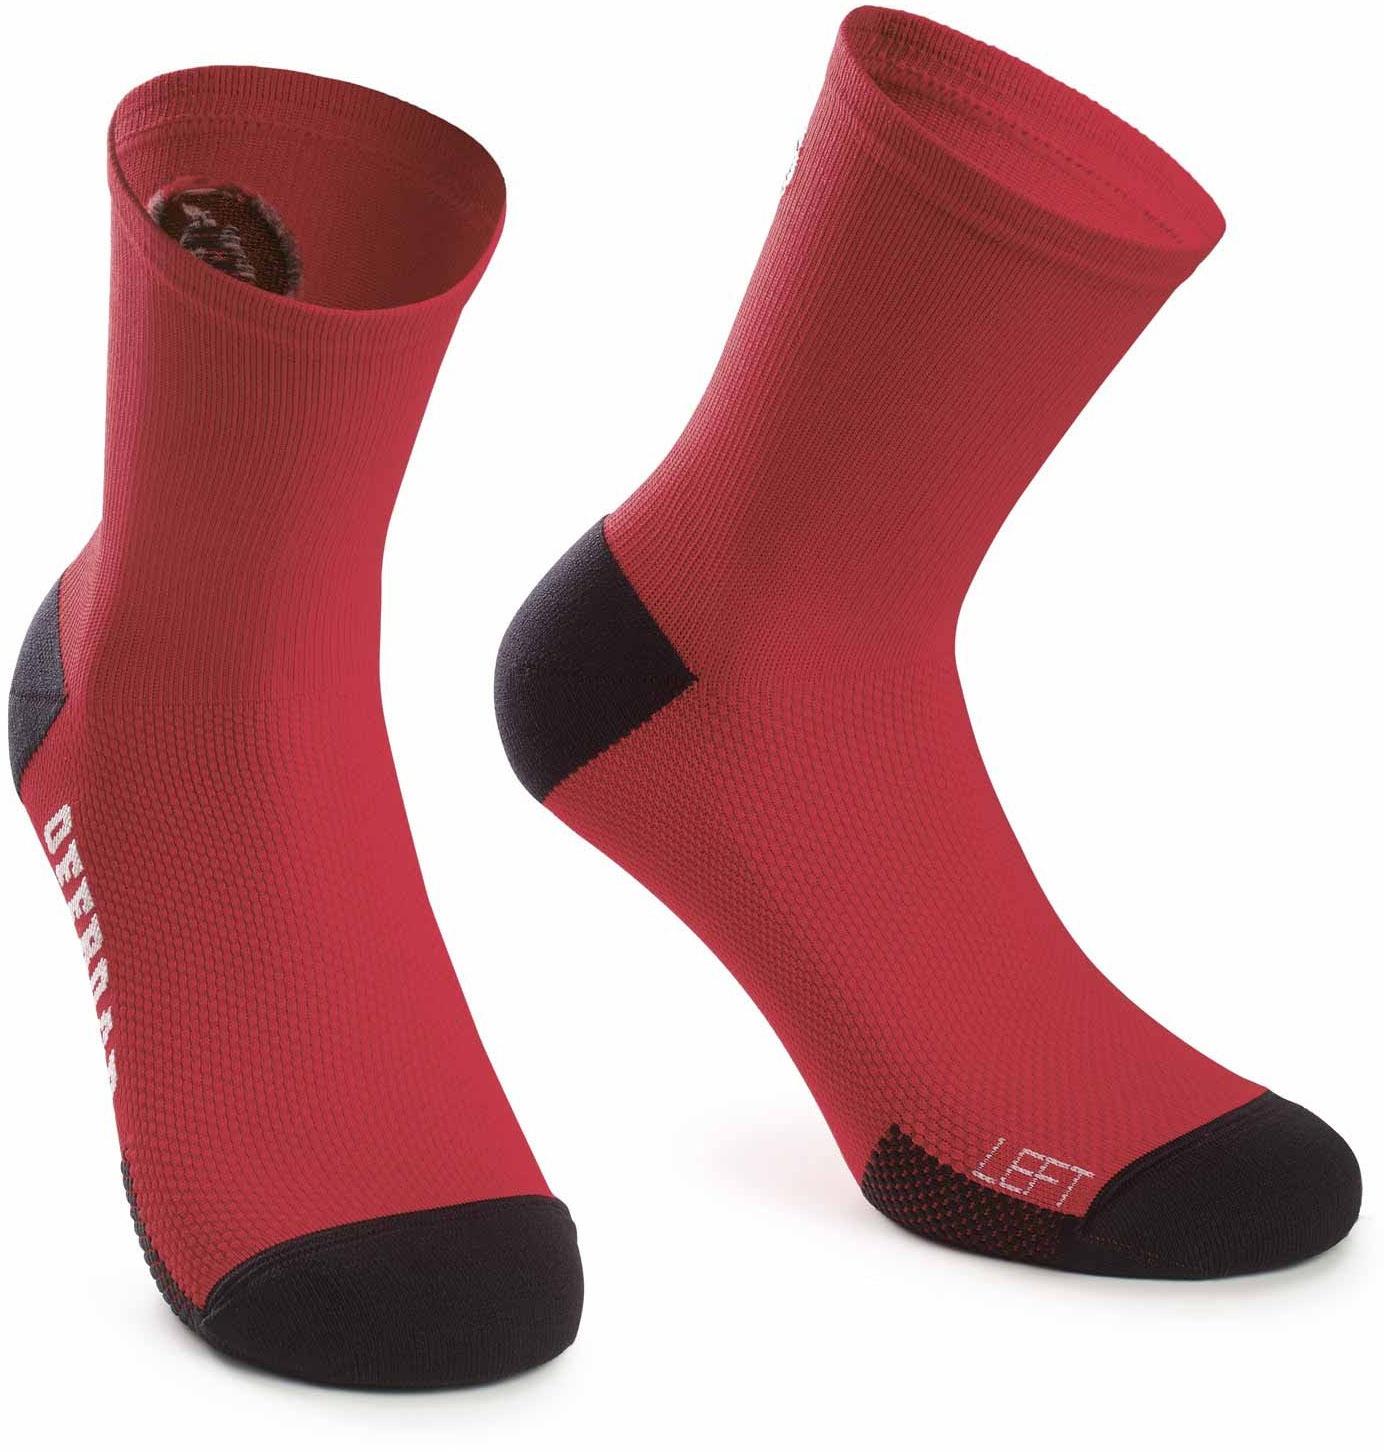 assos xc sokker - rød fra assos